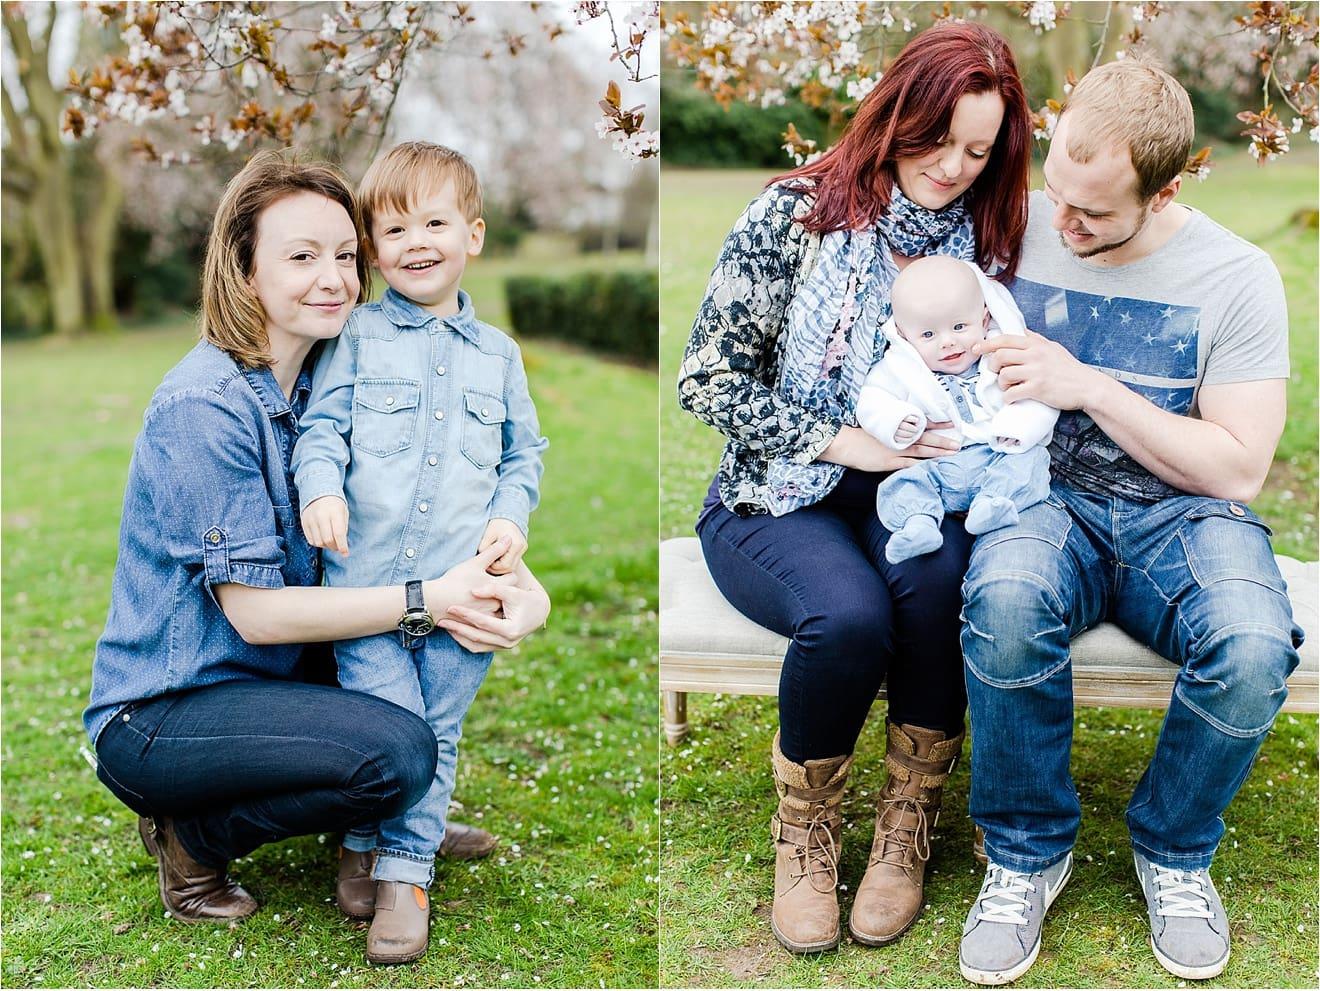 family-photography-spring-weybridge-eddie-judd-photography_0026